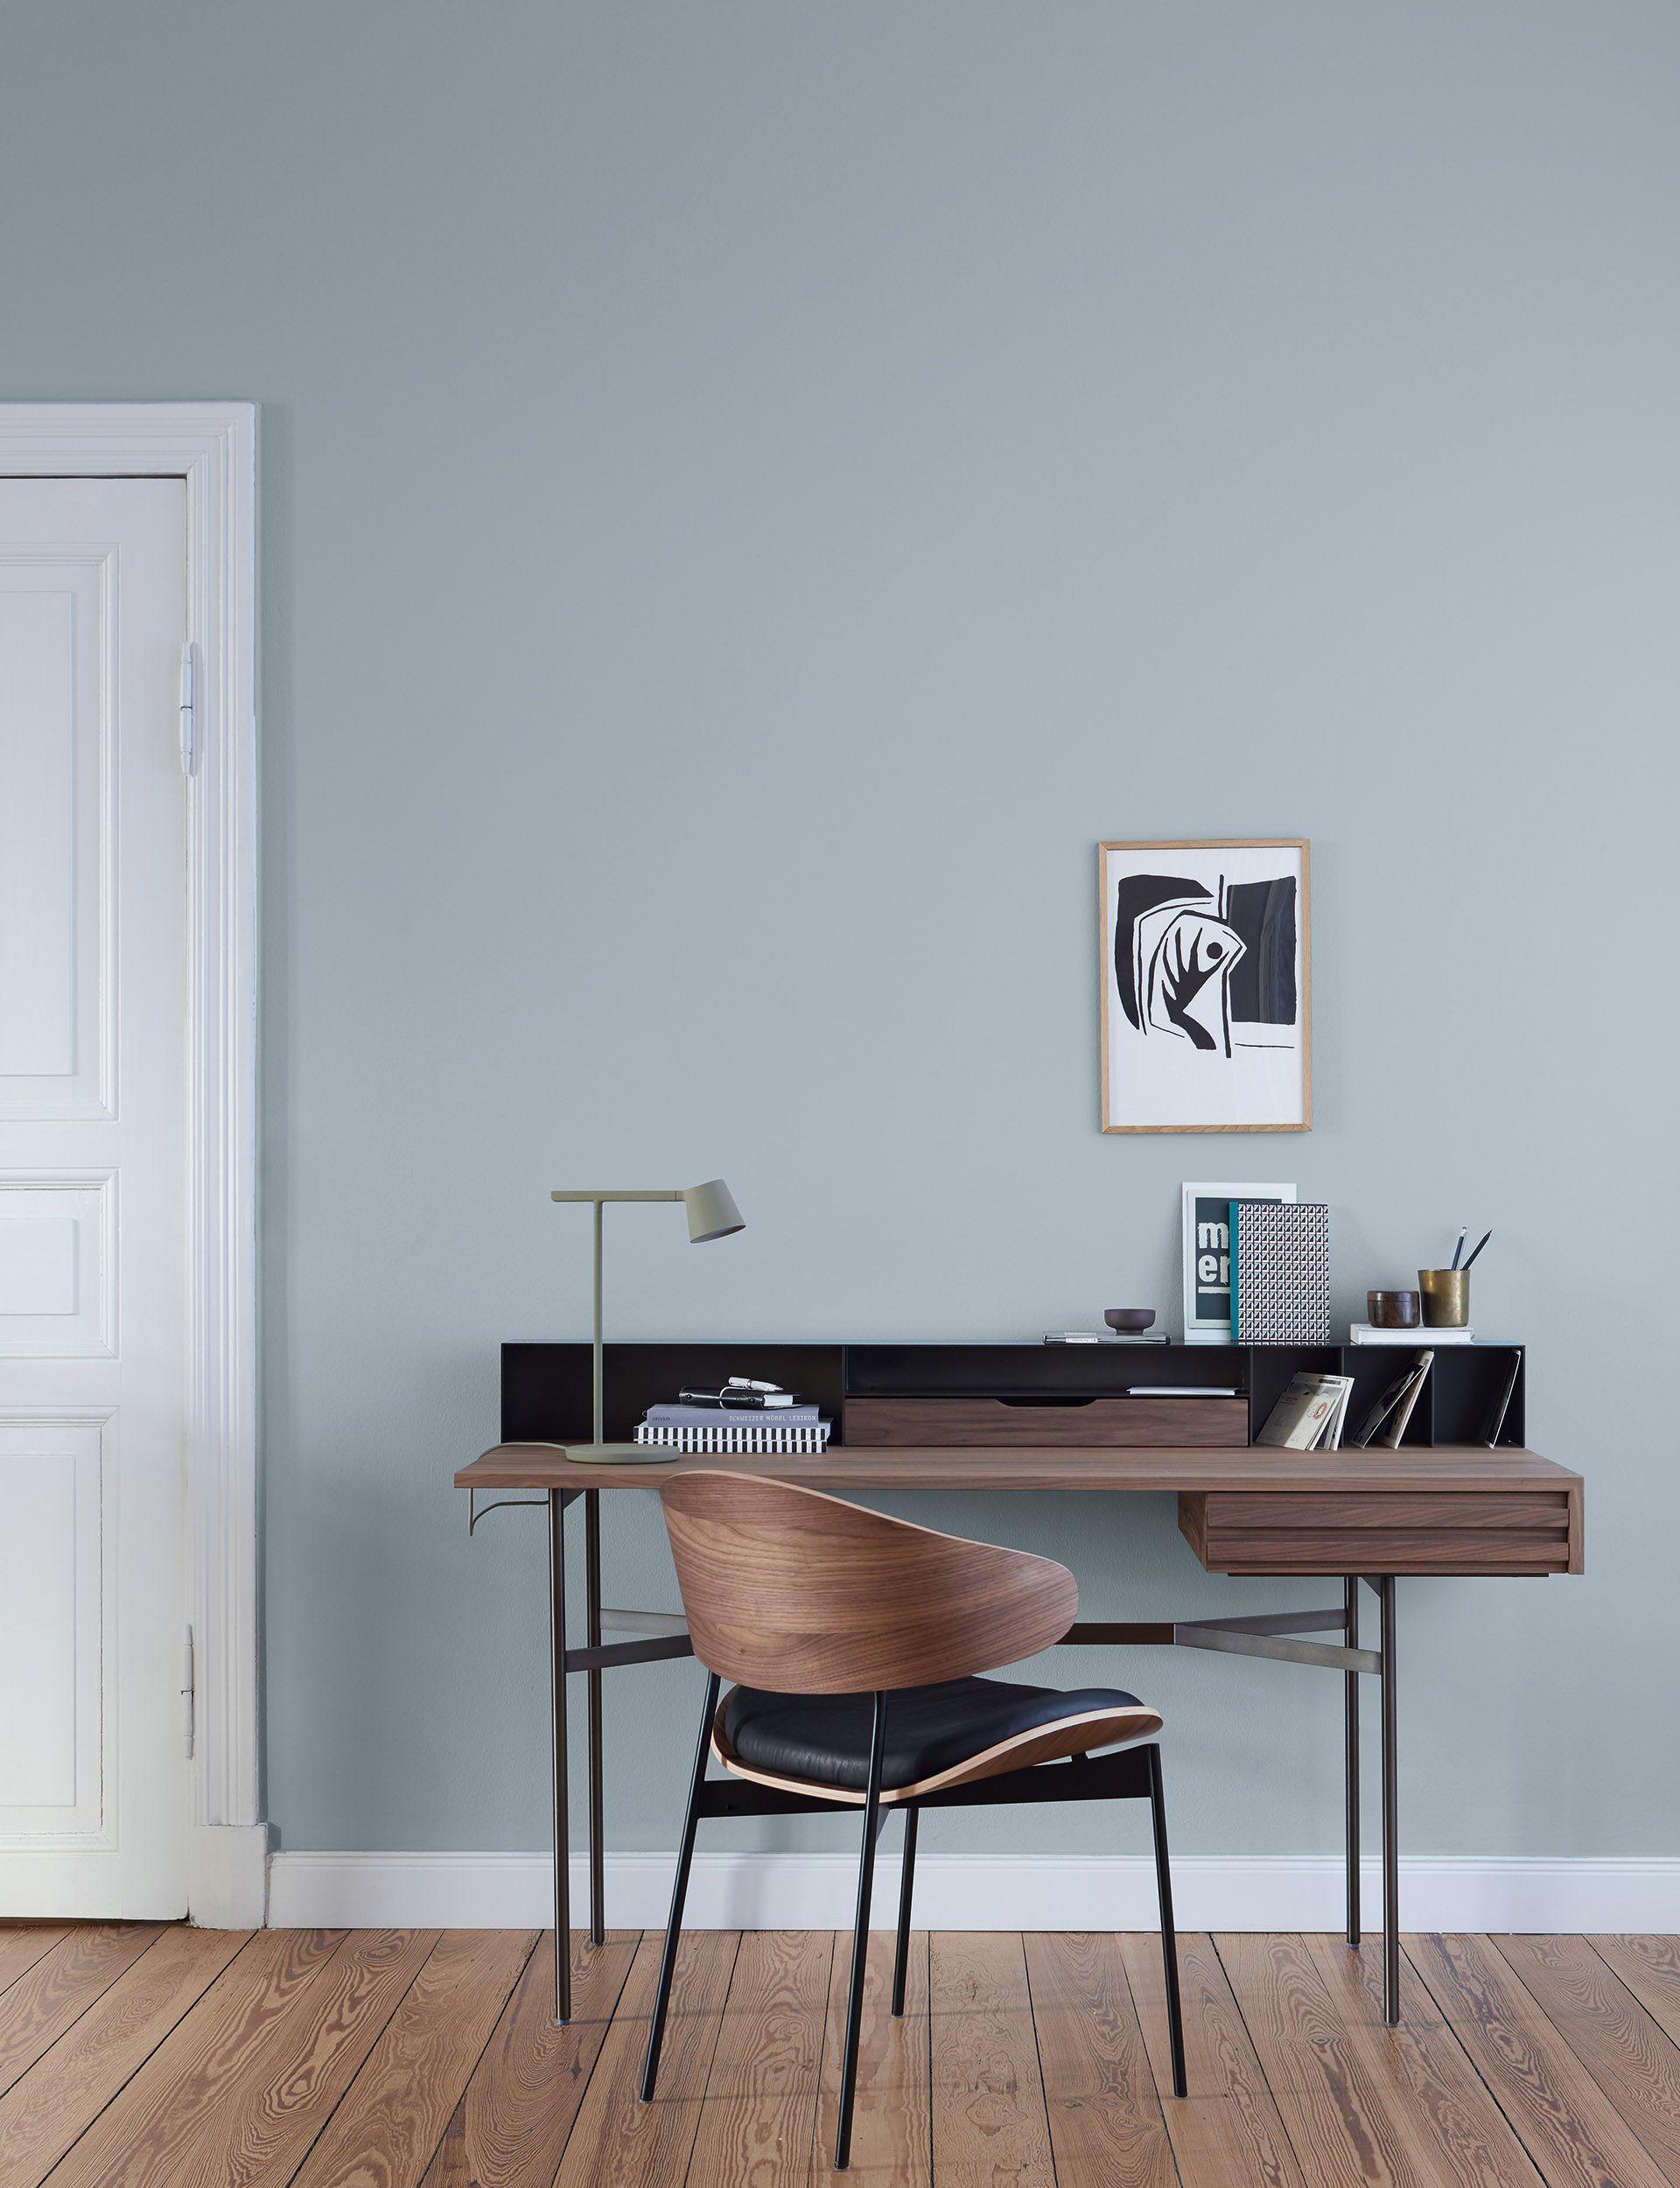 Modern Einrichten Alpina Feine Farben Steinblaue Schonheit Grau Blaue Wandfarbe Alpinafeinefarben Erlesene Pigment In 2020 Blaue Wandfarbe Feine Farben Wandfarbe